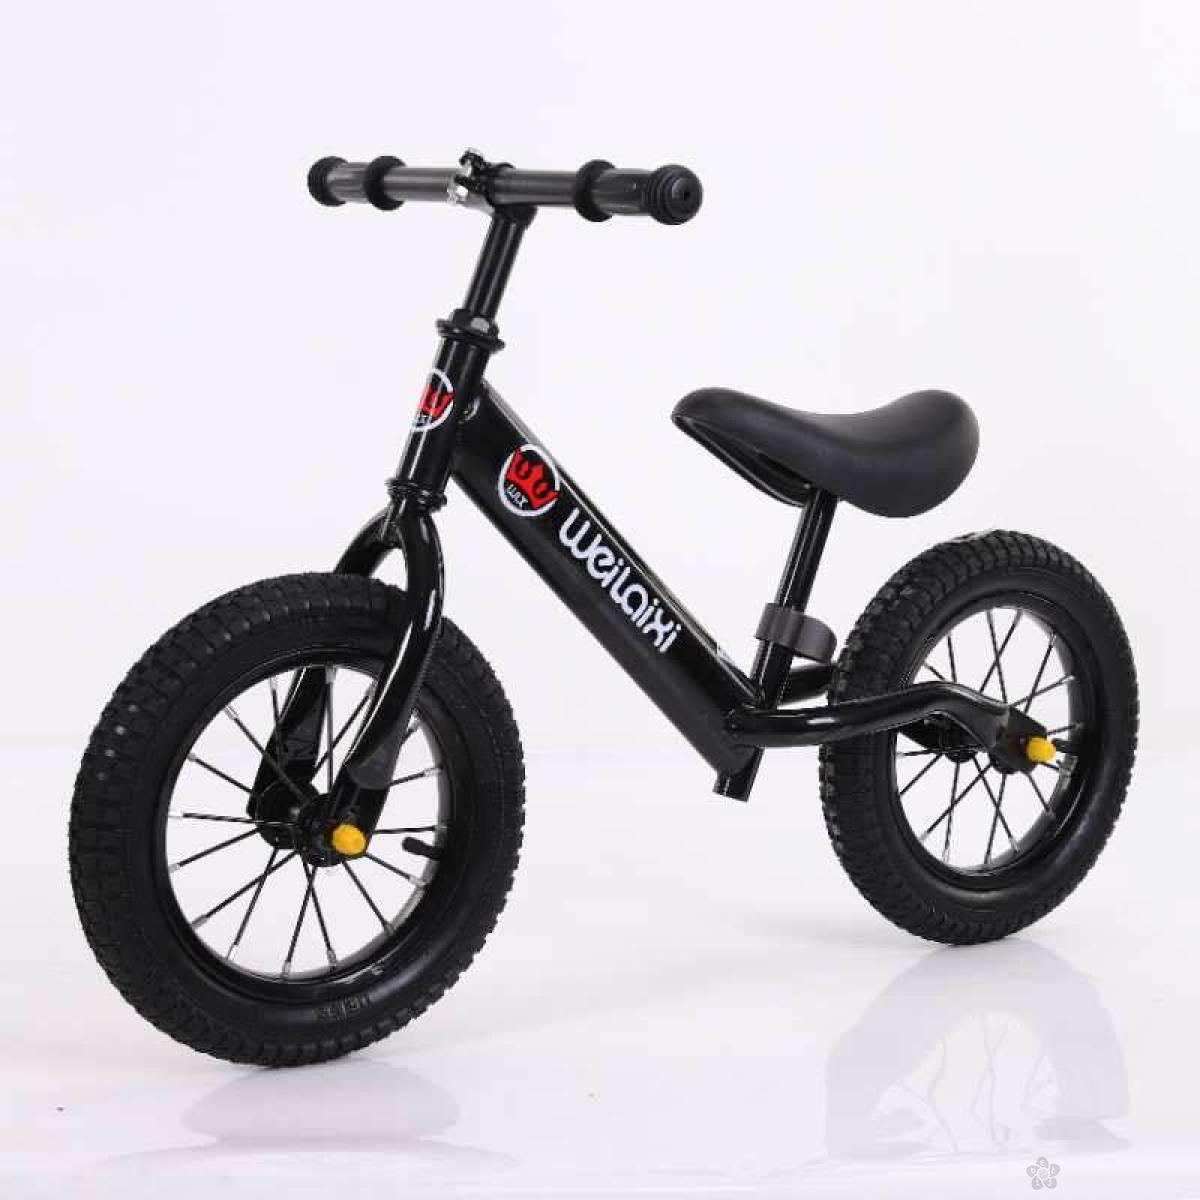 Balans bicikl model 760